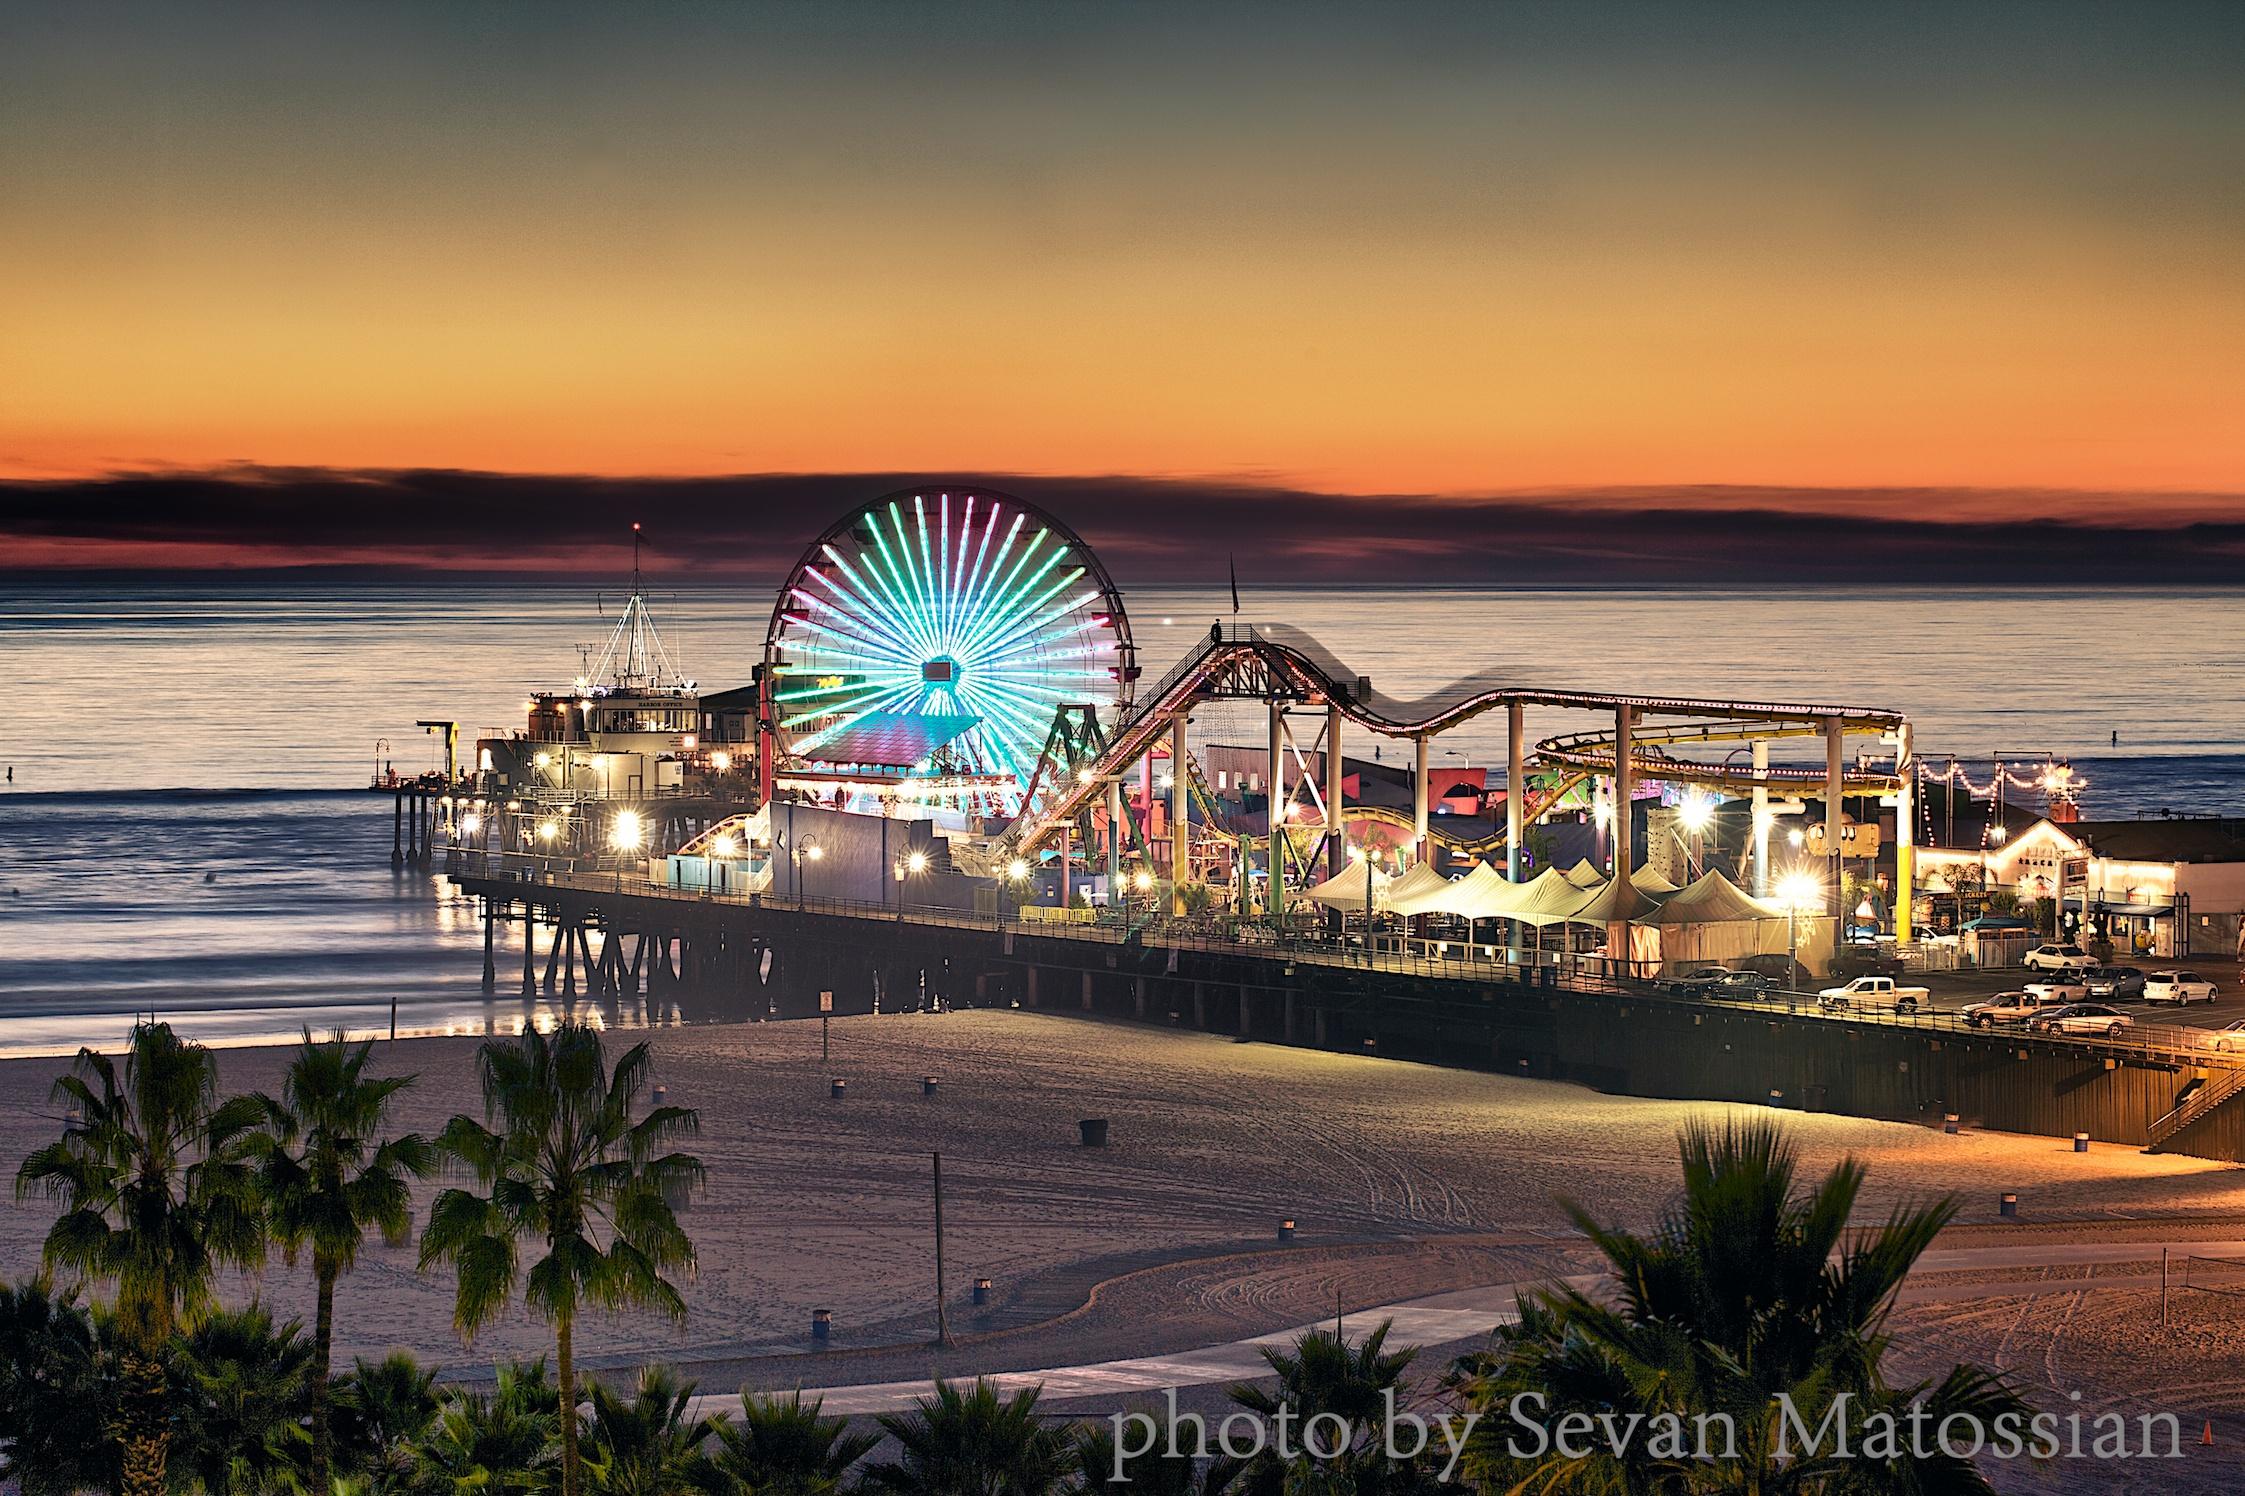 The Santa Monica Pier at night.